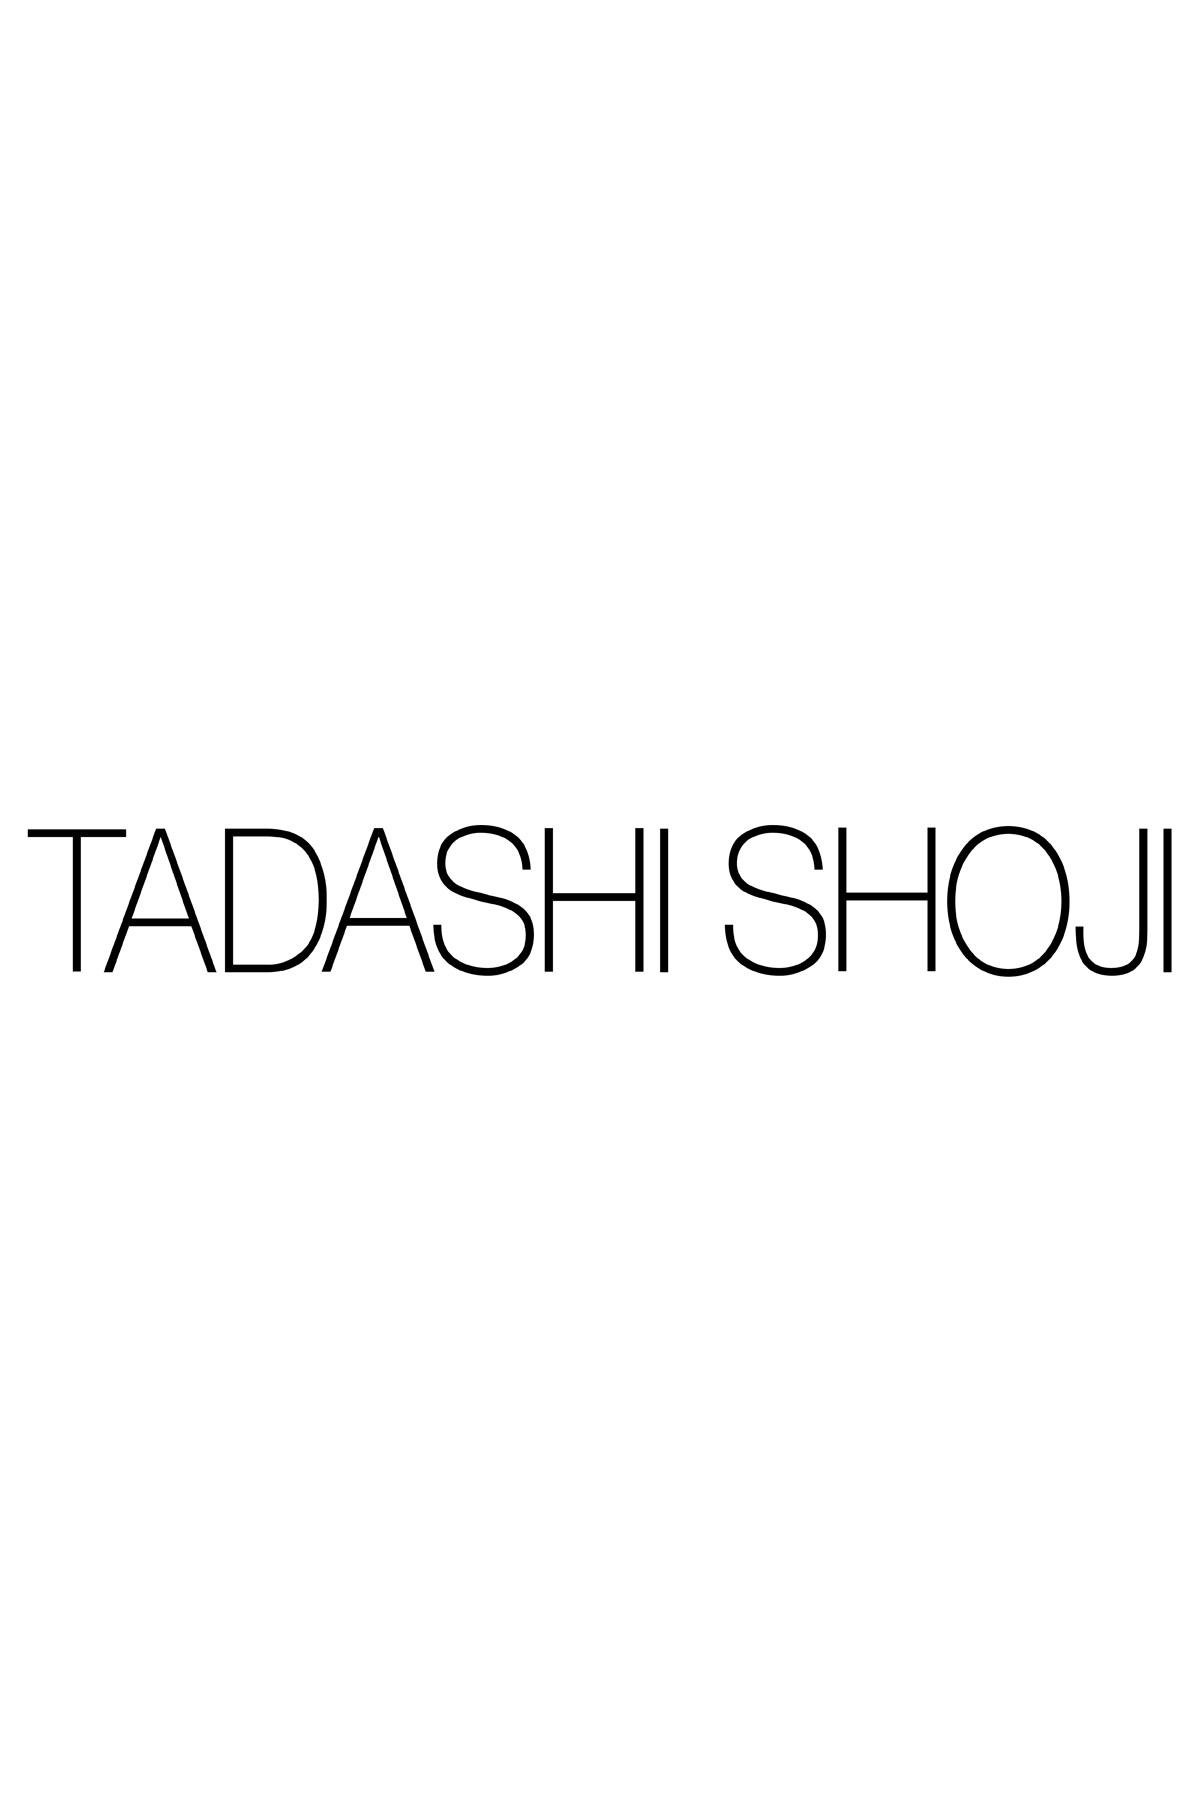 dd8cc0e4abc Tadashi Shoji - Seddon One-Shoulder Neoprene Dress - PLUS SIZE ...